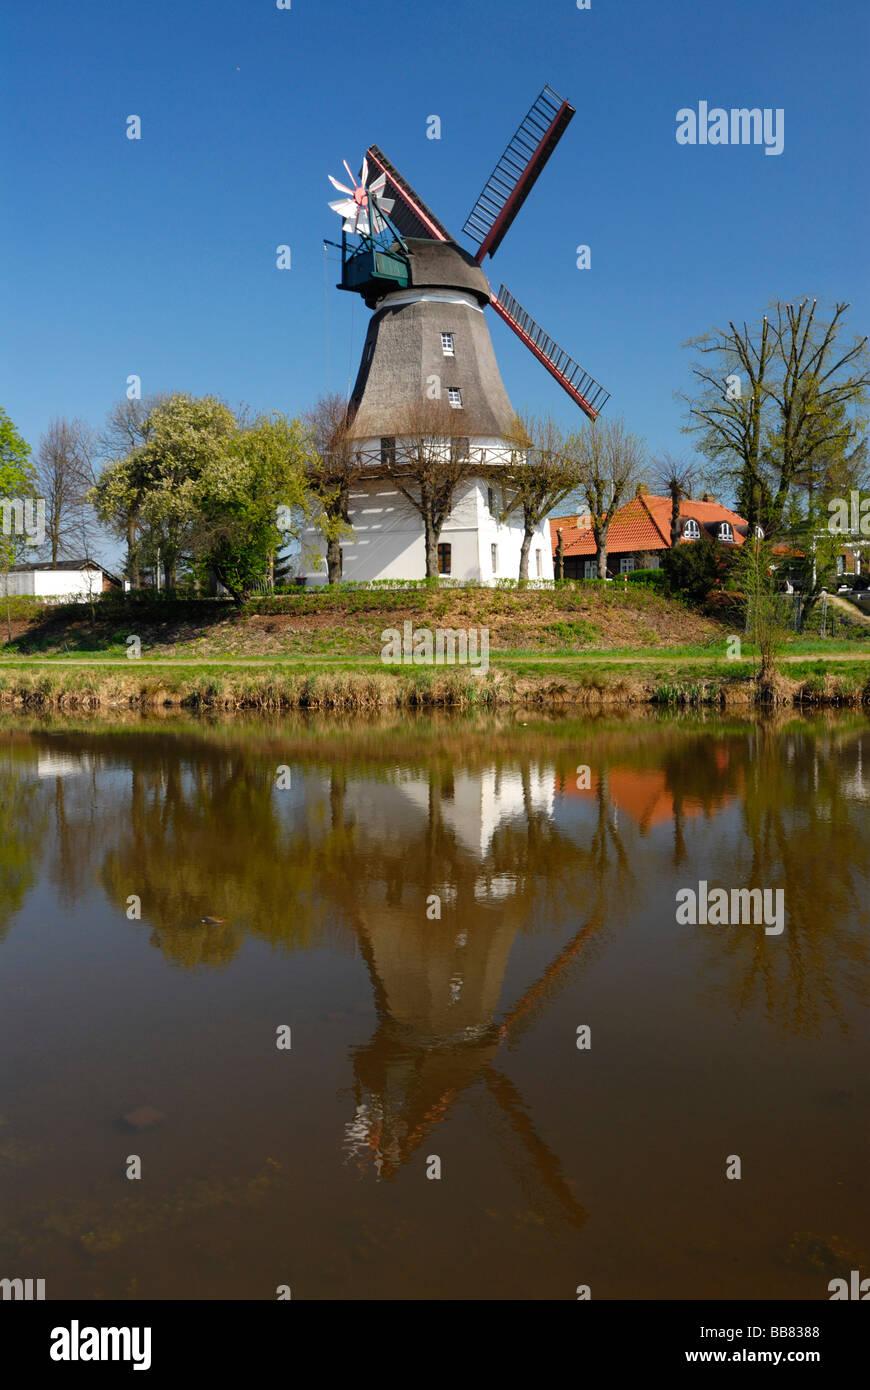 Historic Johanna windmill in Wilhelmsburg, Hamburg, Germany, Europe - Stock Image